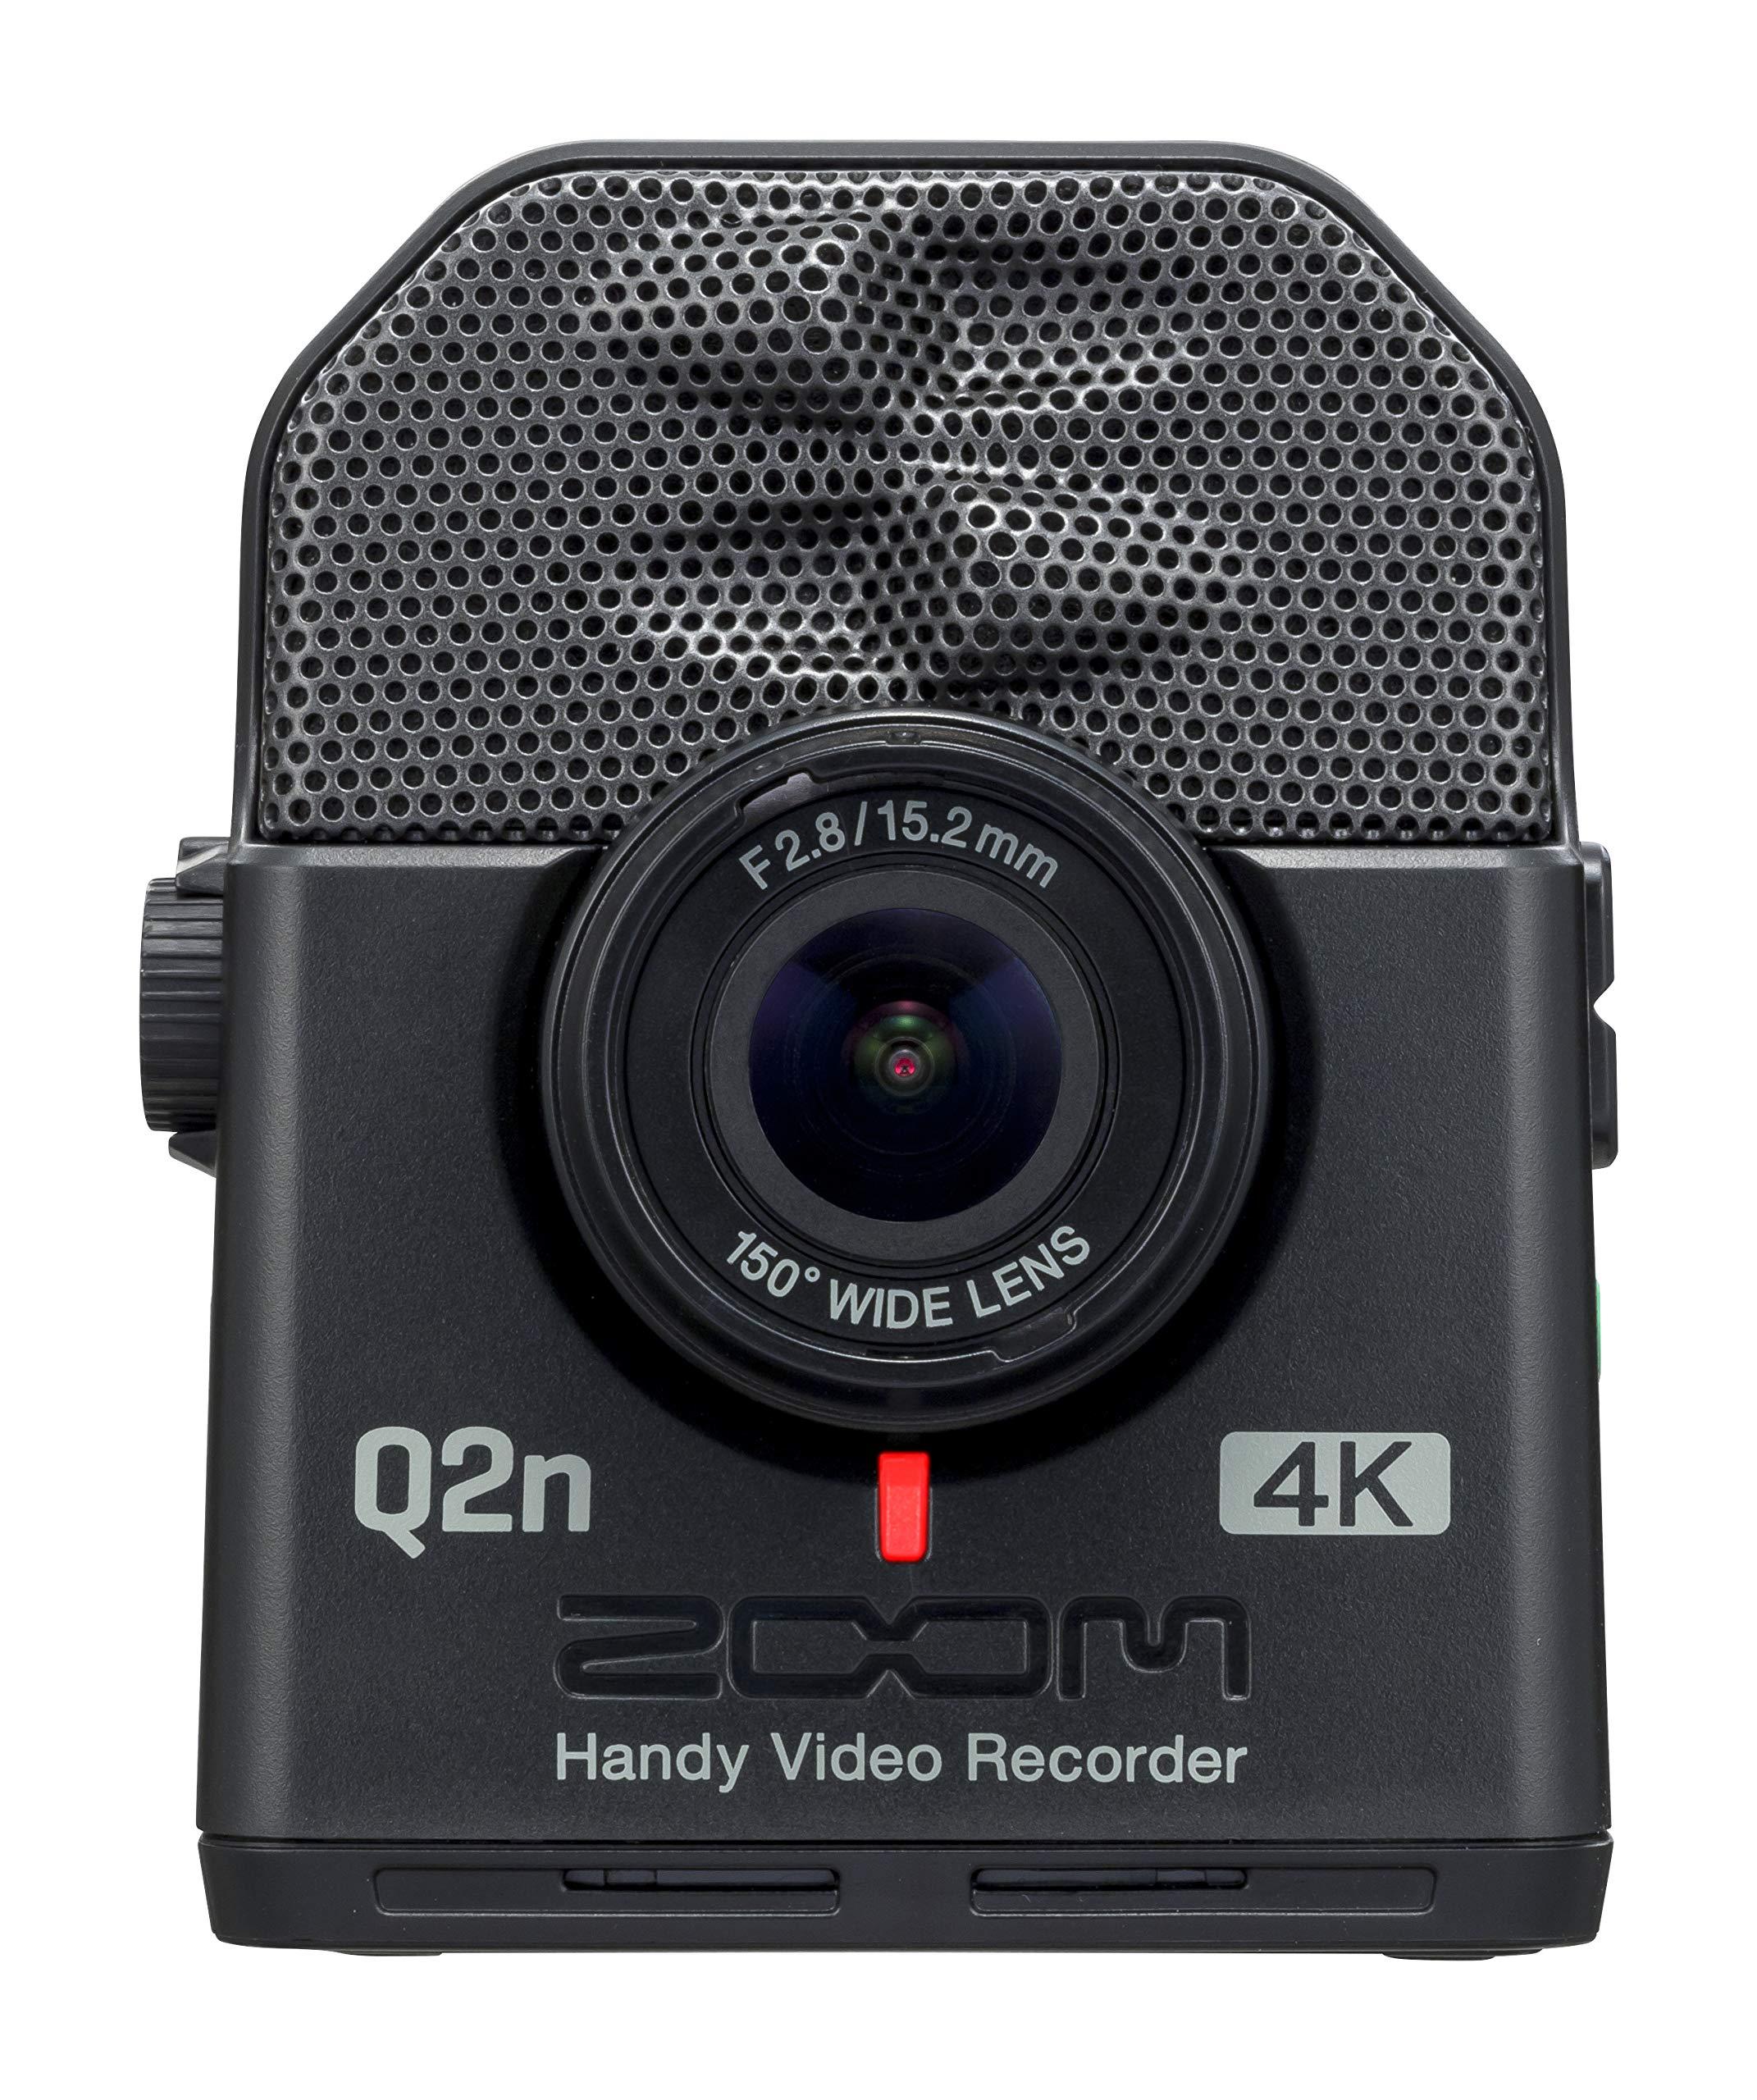 ZOOM Handy Video Recorder Q2n Black Built-In XY Mic New in Box